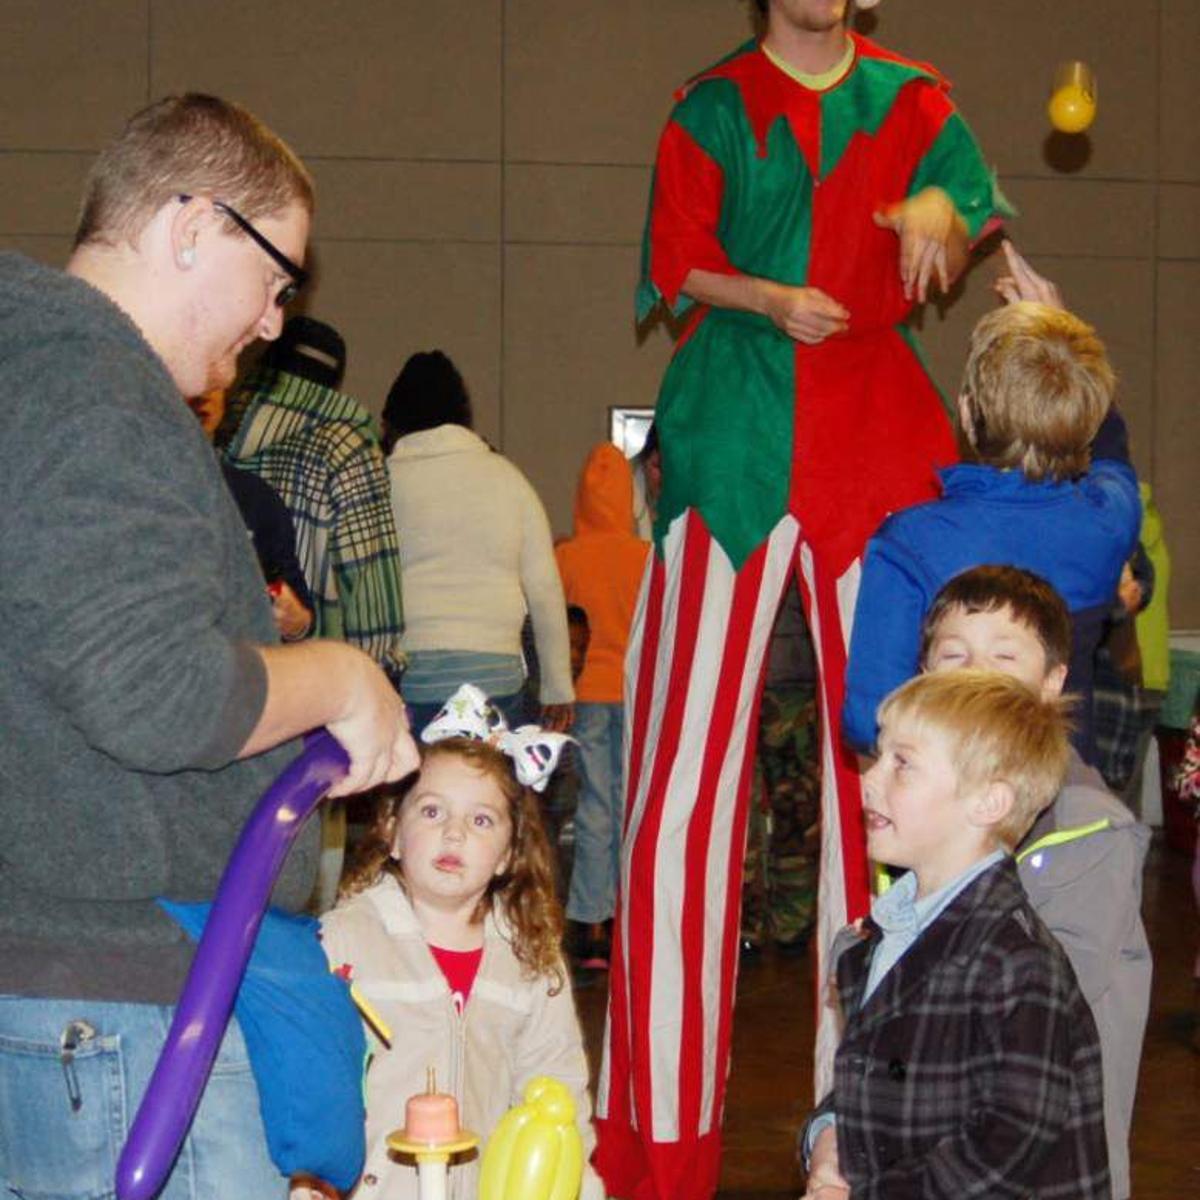 Cottonport Christmas On The Bayou 2021 Outlying Areas Calendar For Dec 12 18 2014 Entertainment Life Theadvocate Com